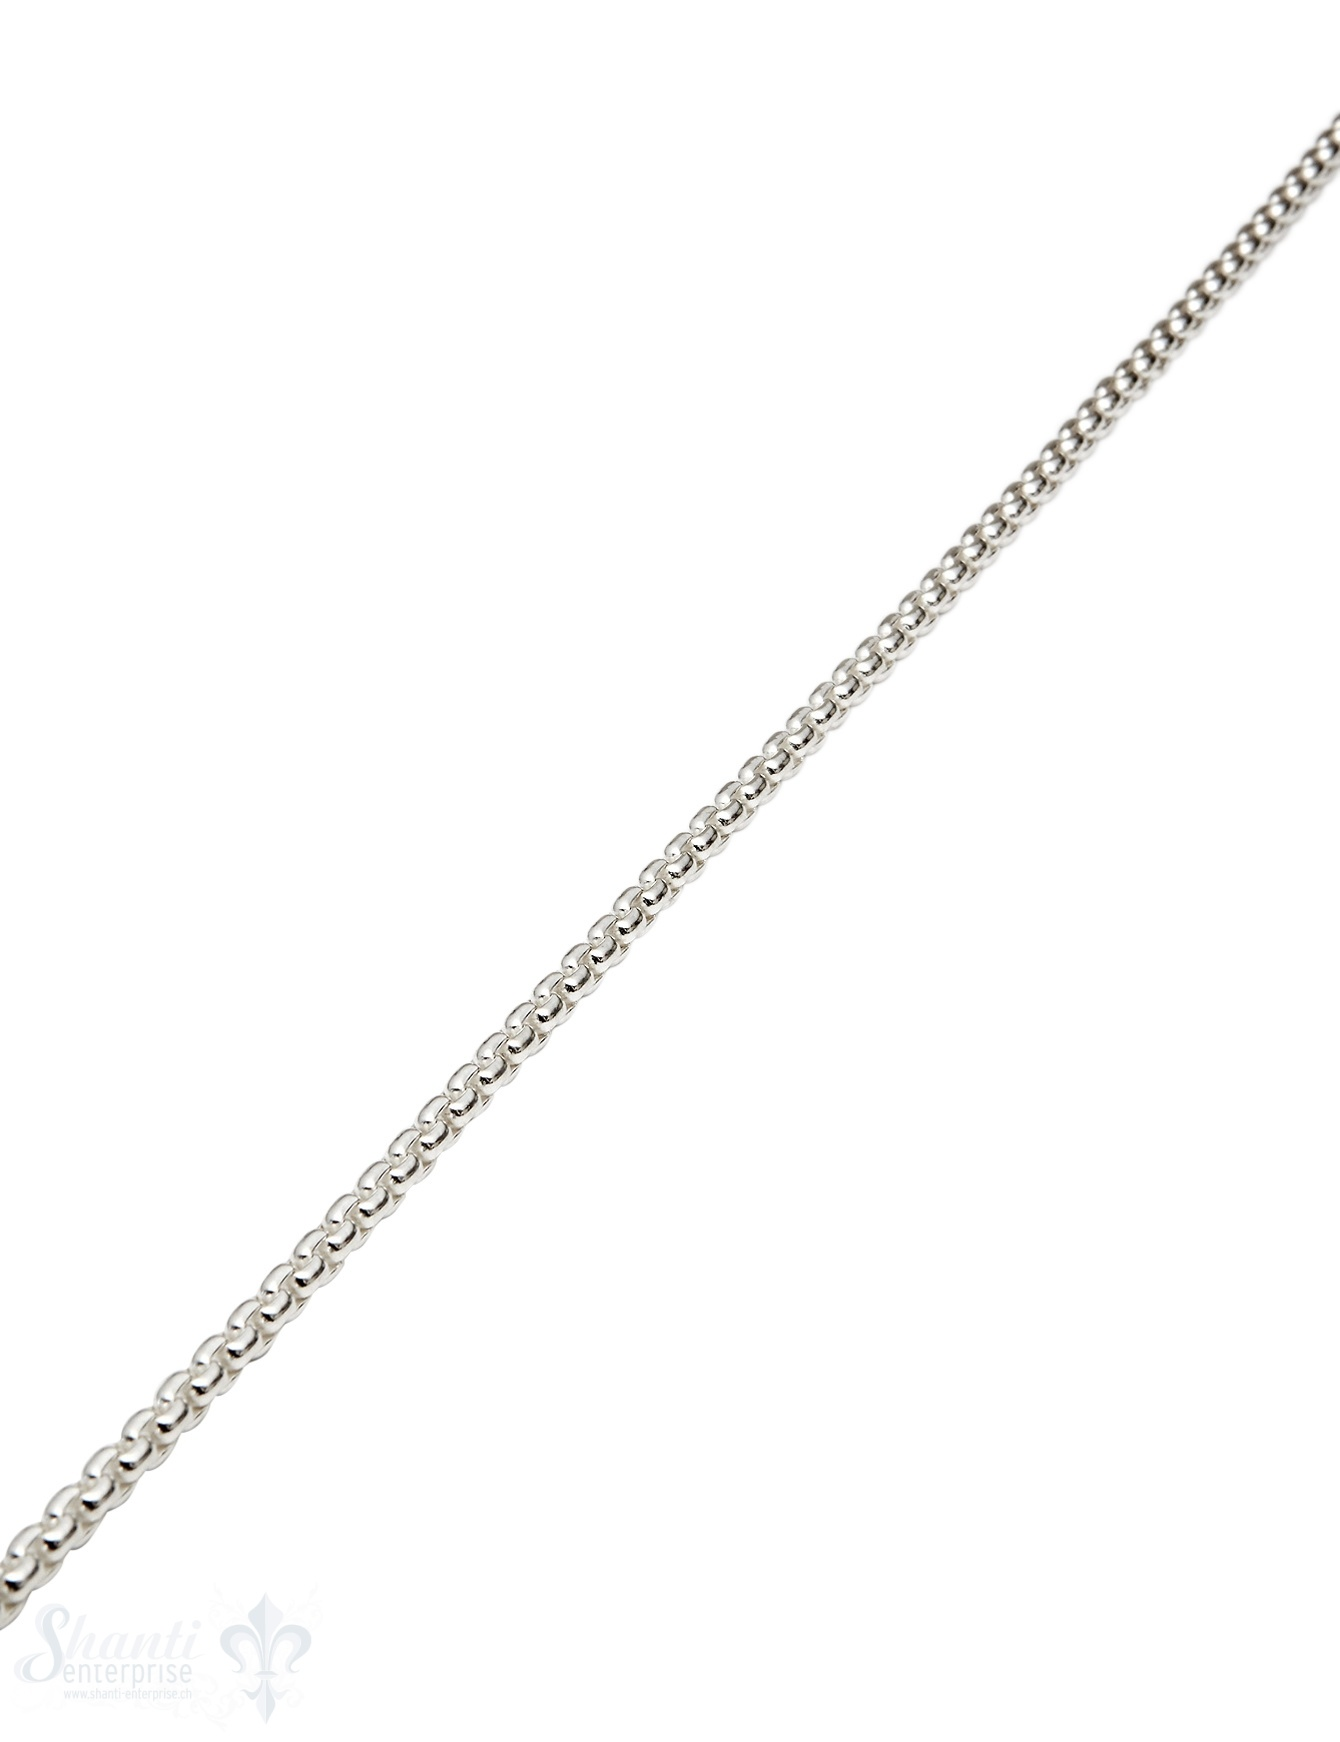 Silberkette quadratisch 4,2x4,2 mm Dicke 2.2 mm Meter ca. Fr. 179.00 Abschnittlänge wird angepasst per cm